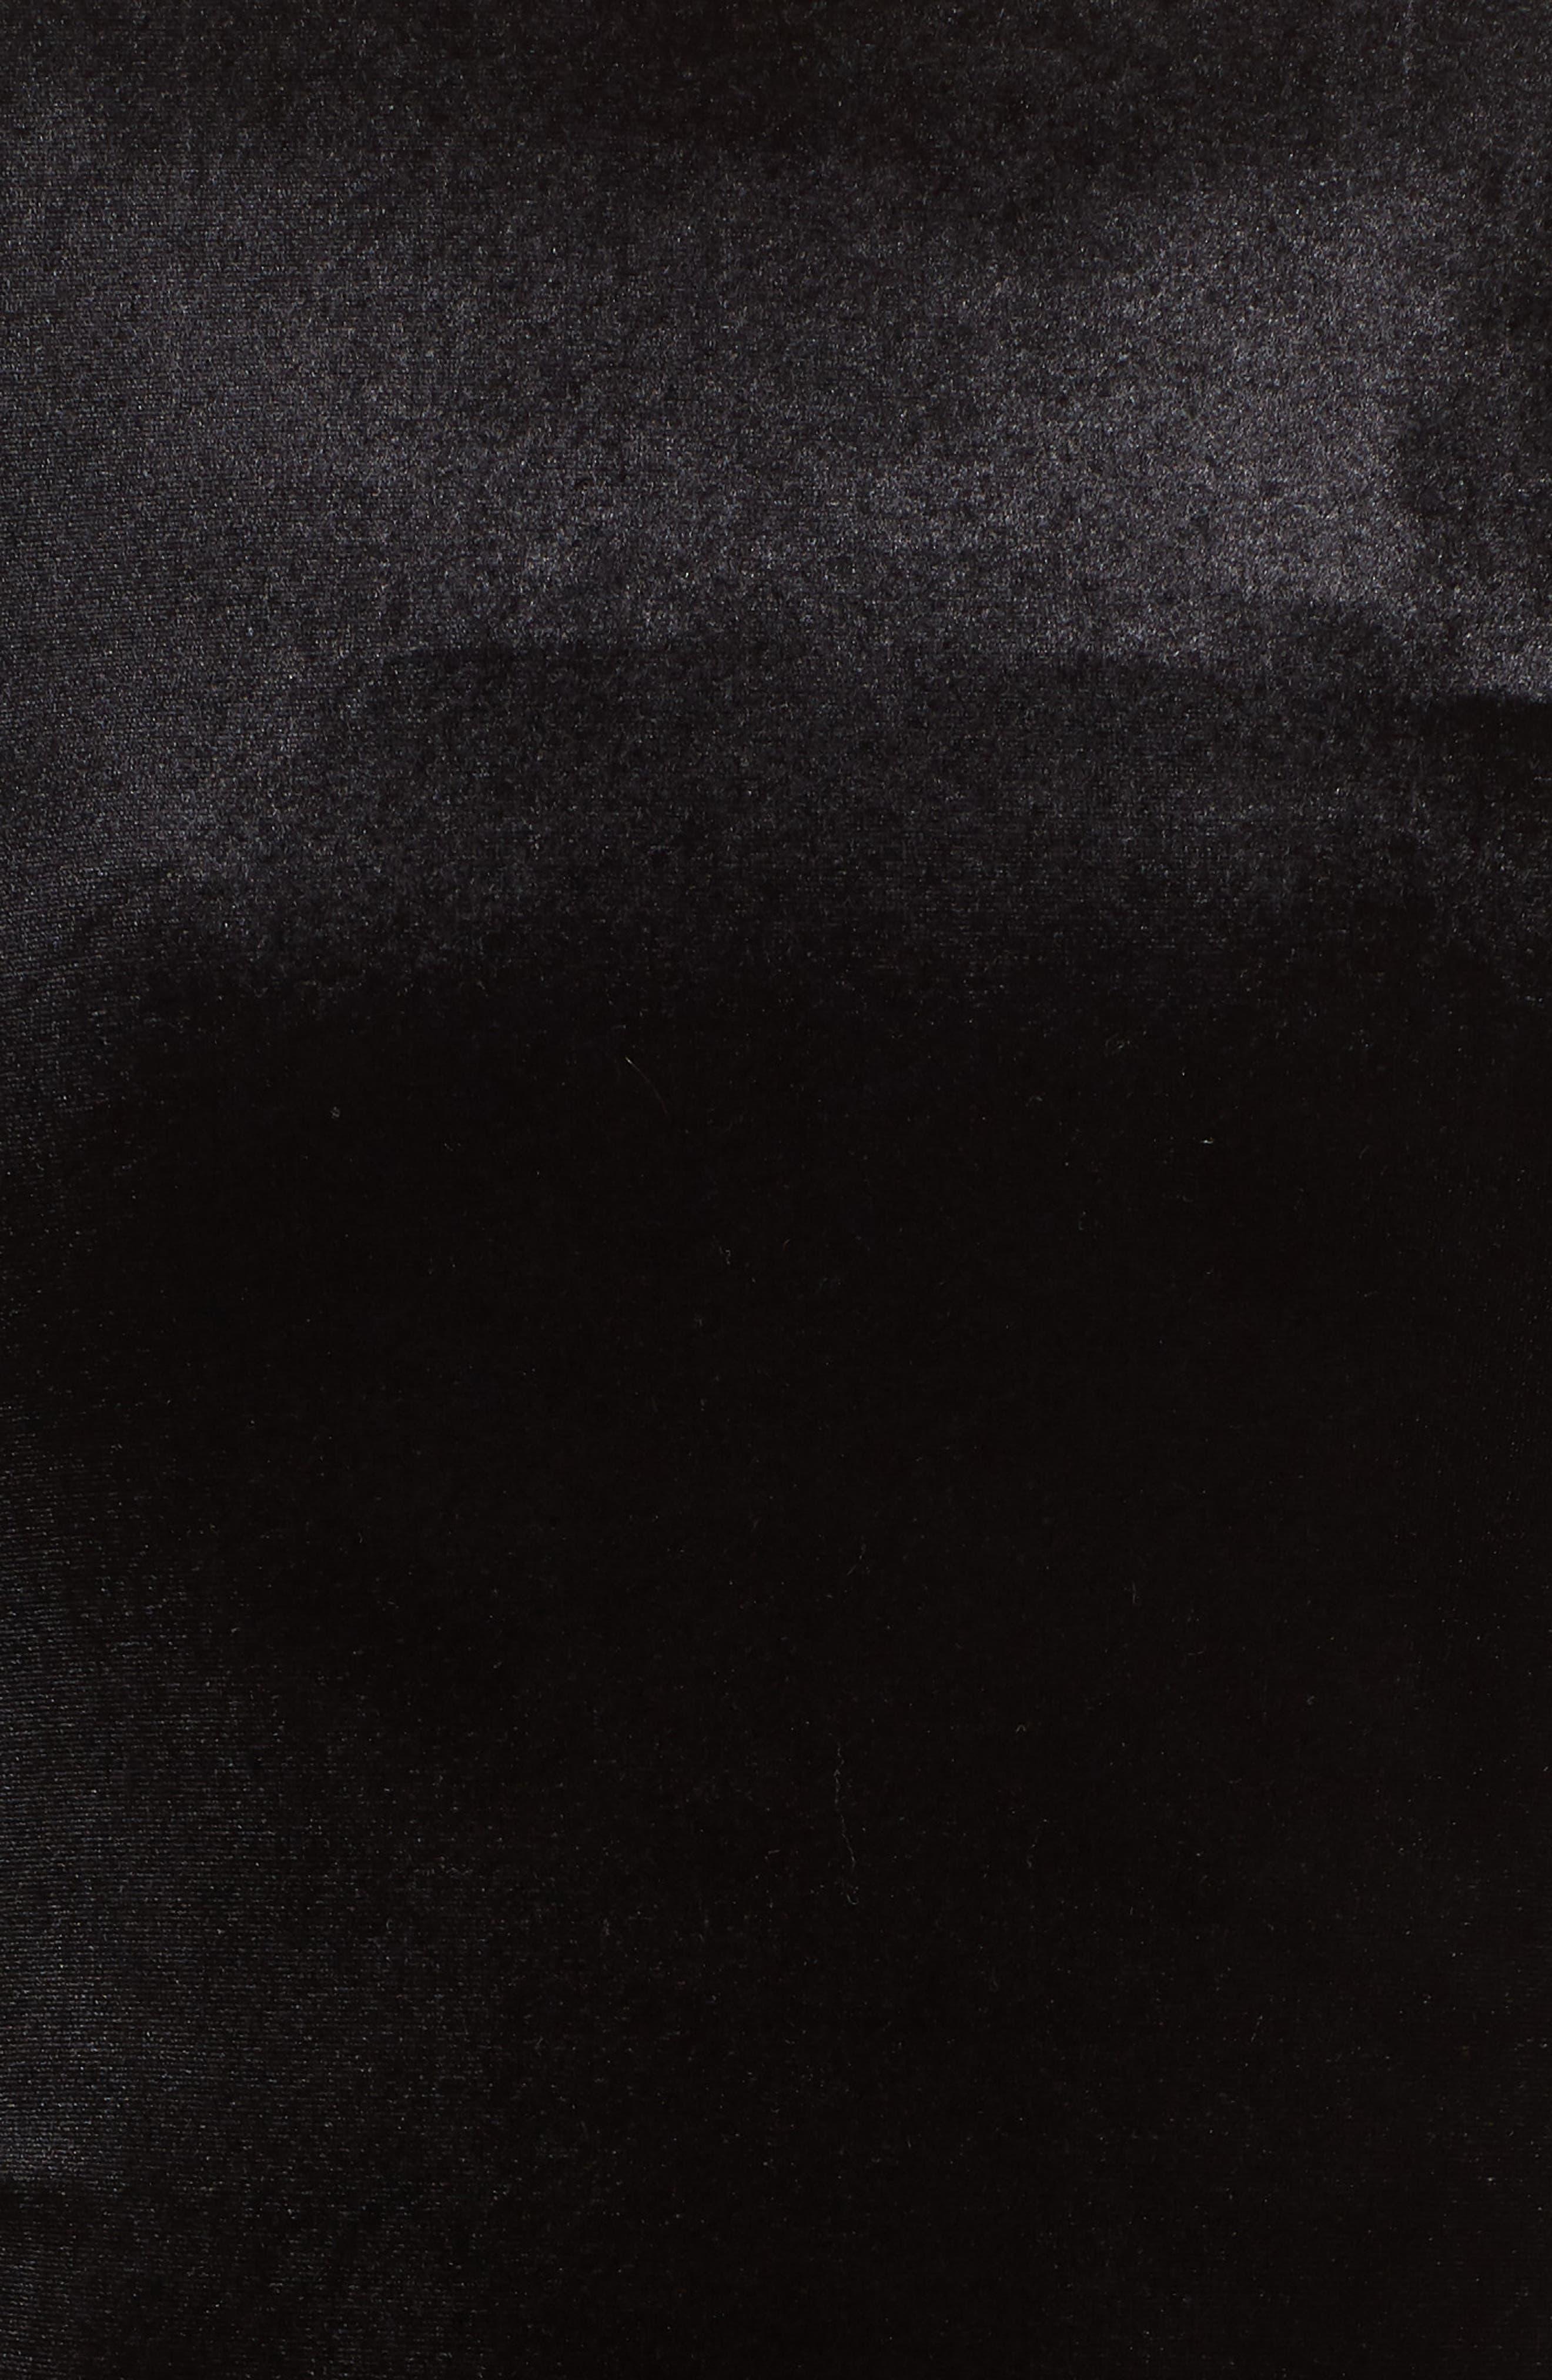 Zella Aurore Velvet Jersey Sheath Dress,                             Alternate thumbnail 6, color,                             BLACK GOLD